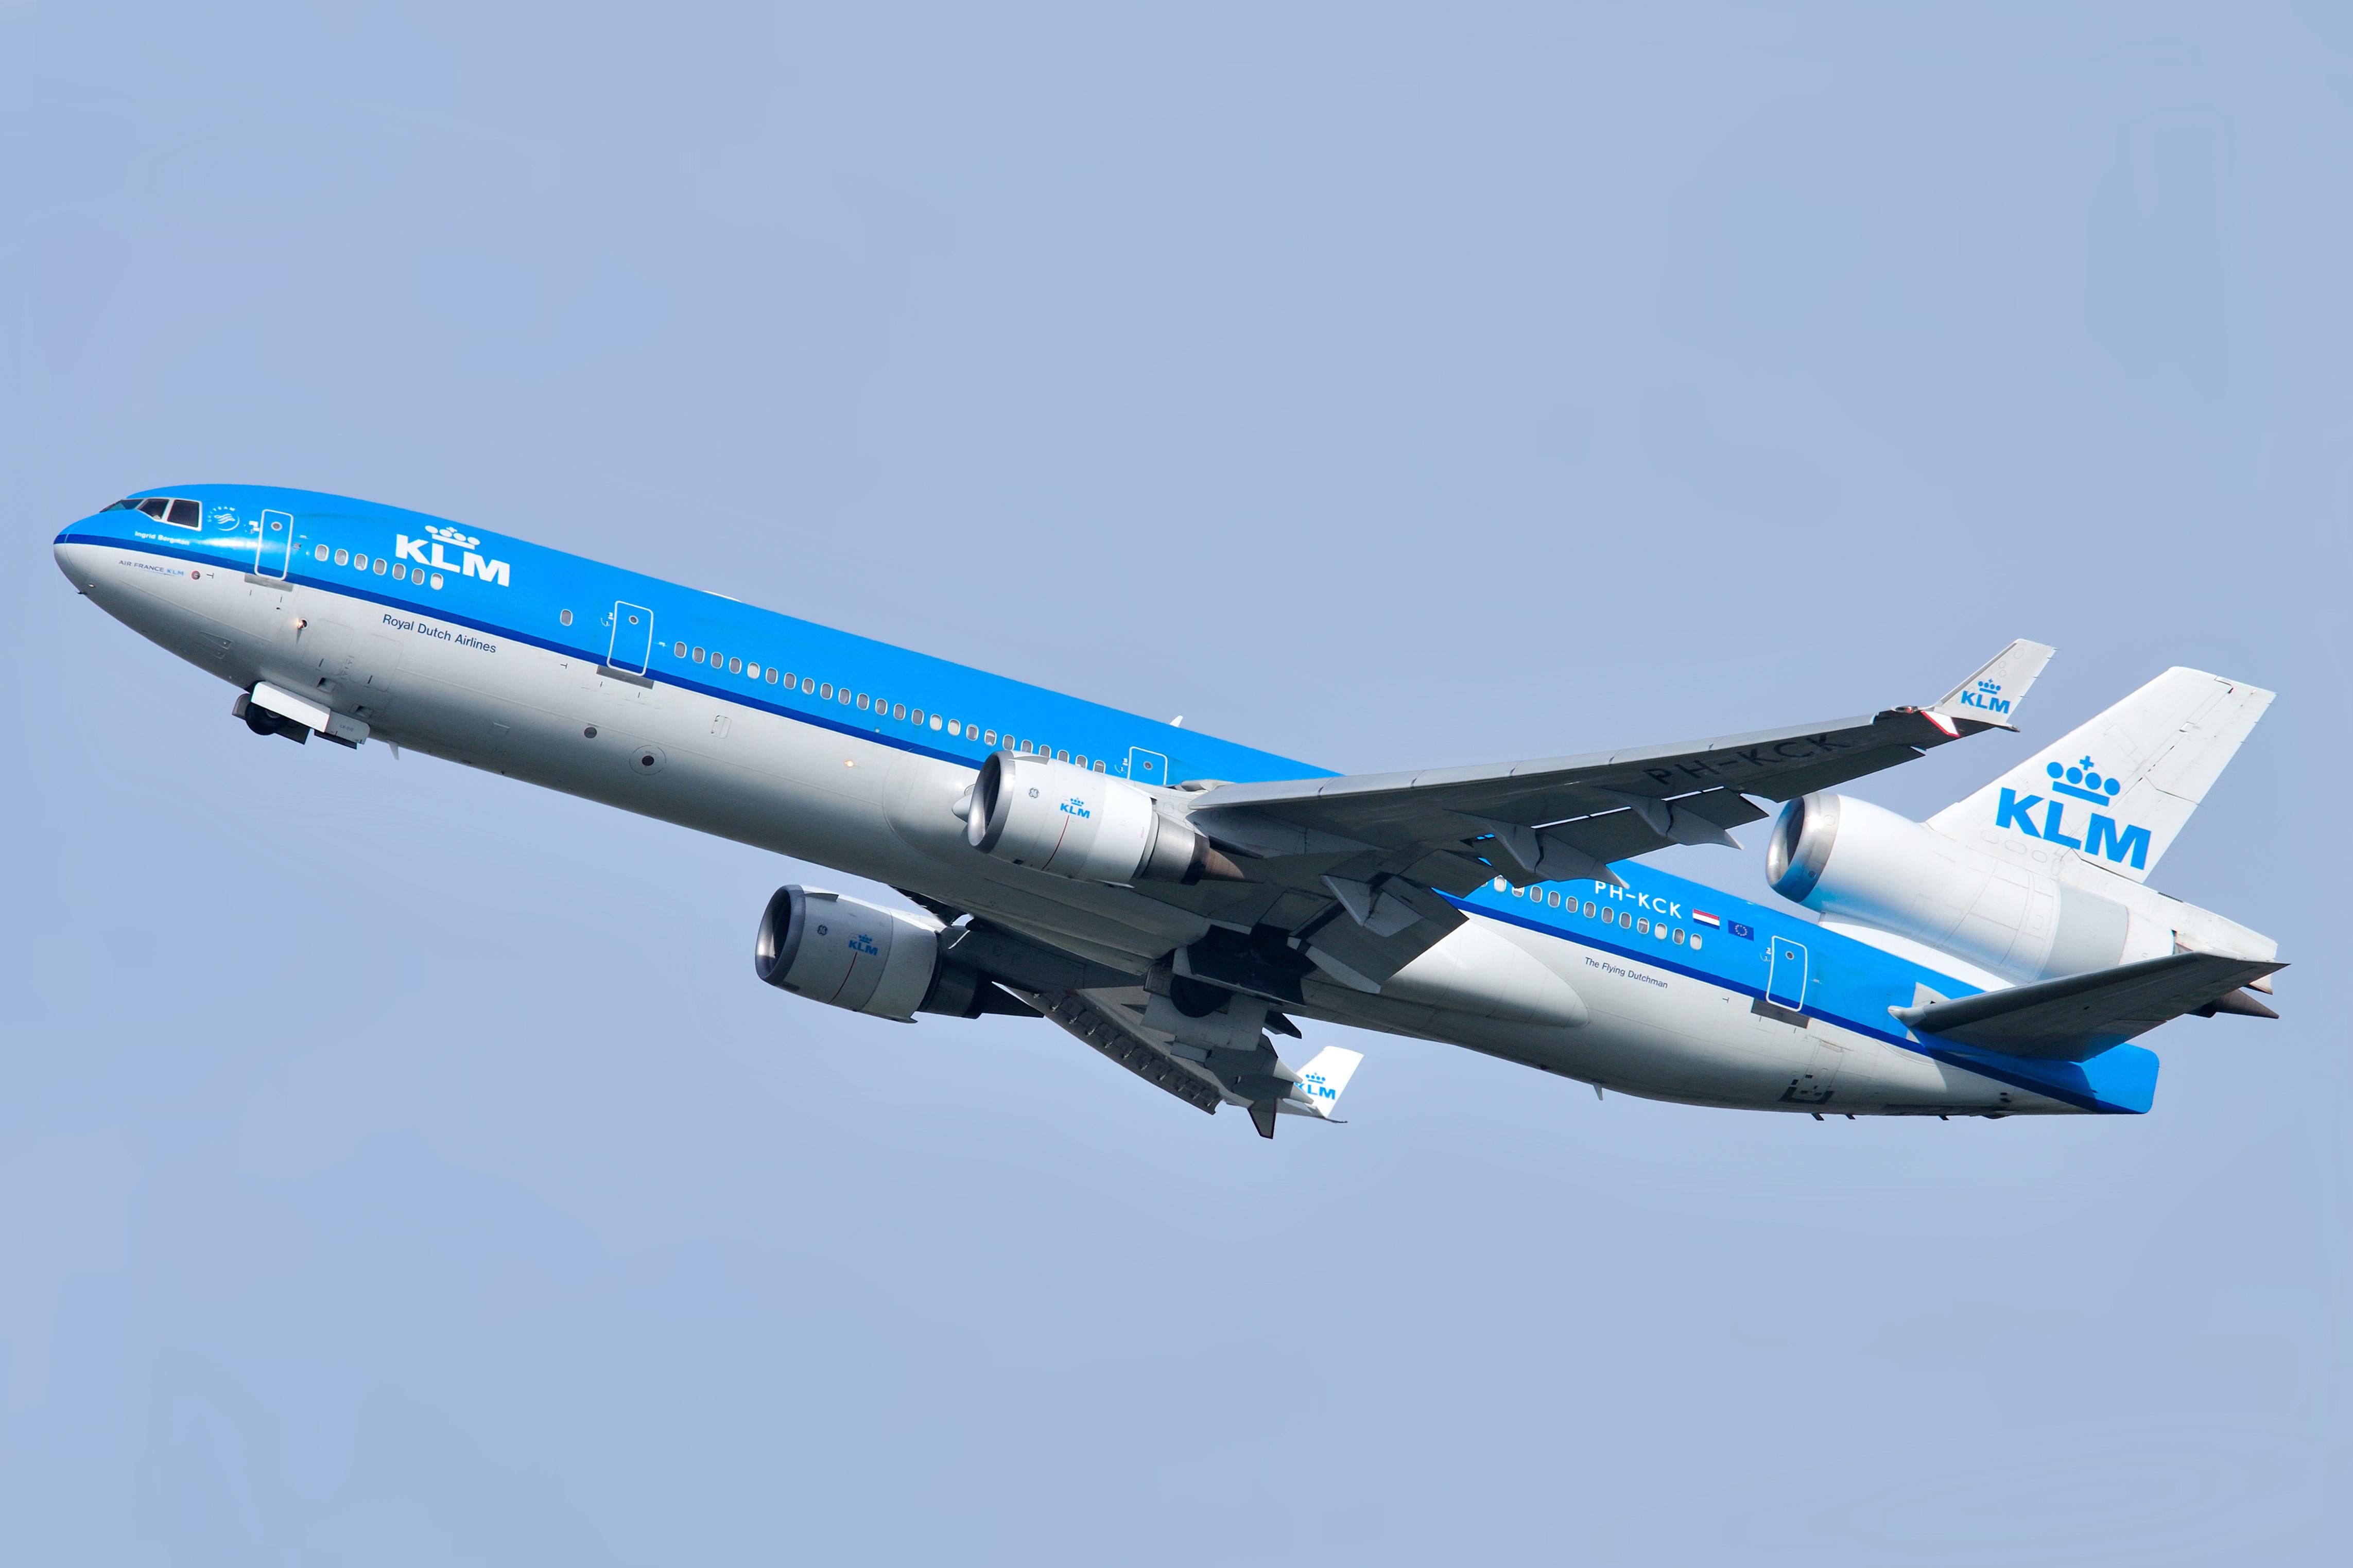 KLM_McDonnell_Douglas_MD 11_PH KCK_Ingrid_Bergman mcdonnell douglas md 11 wikipedia